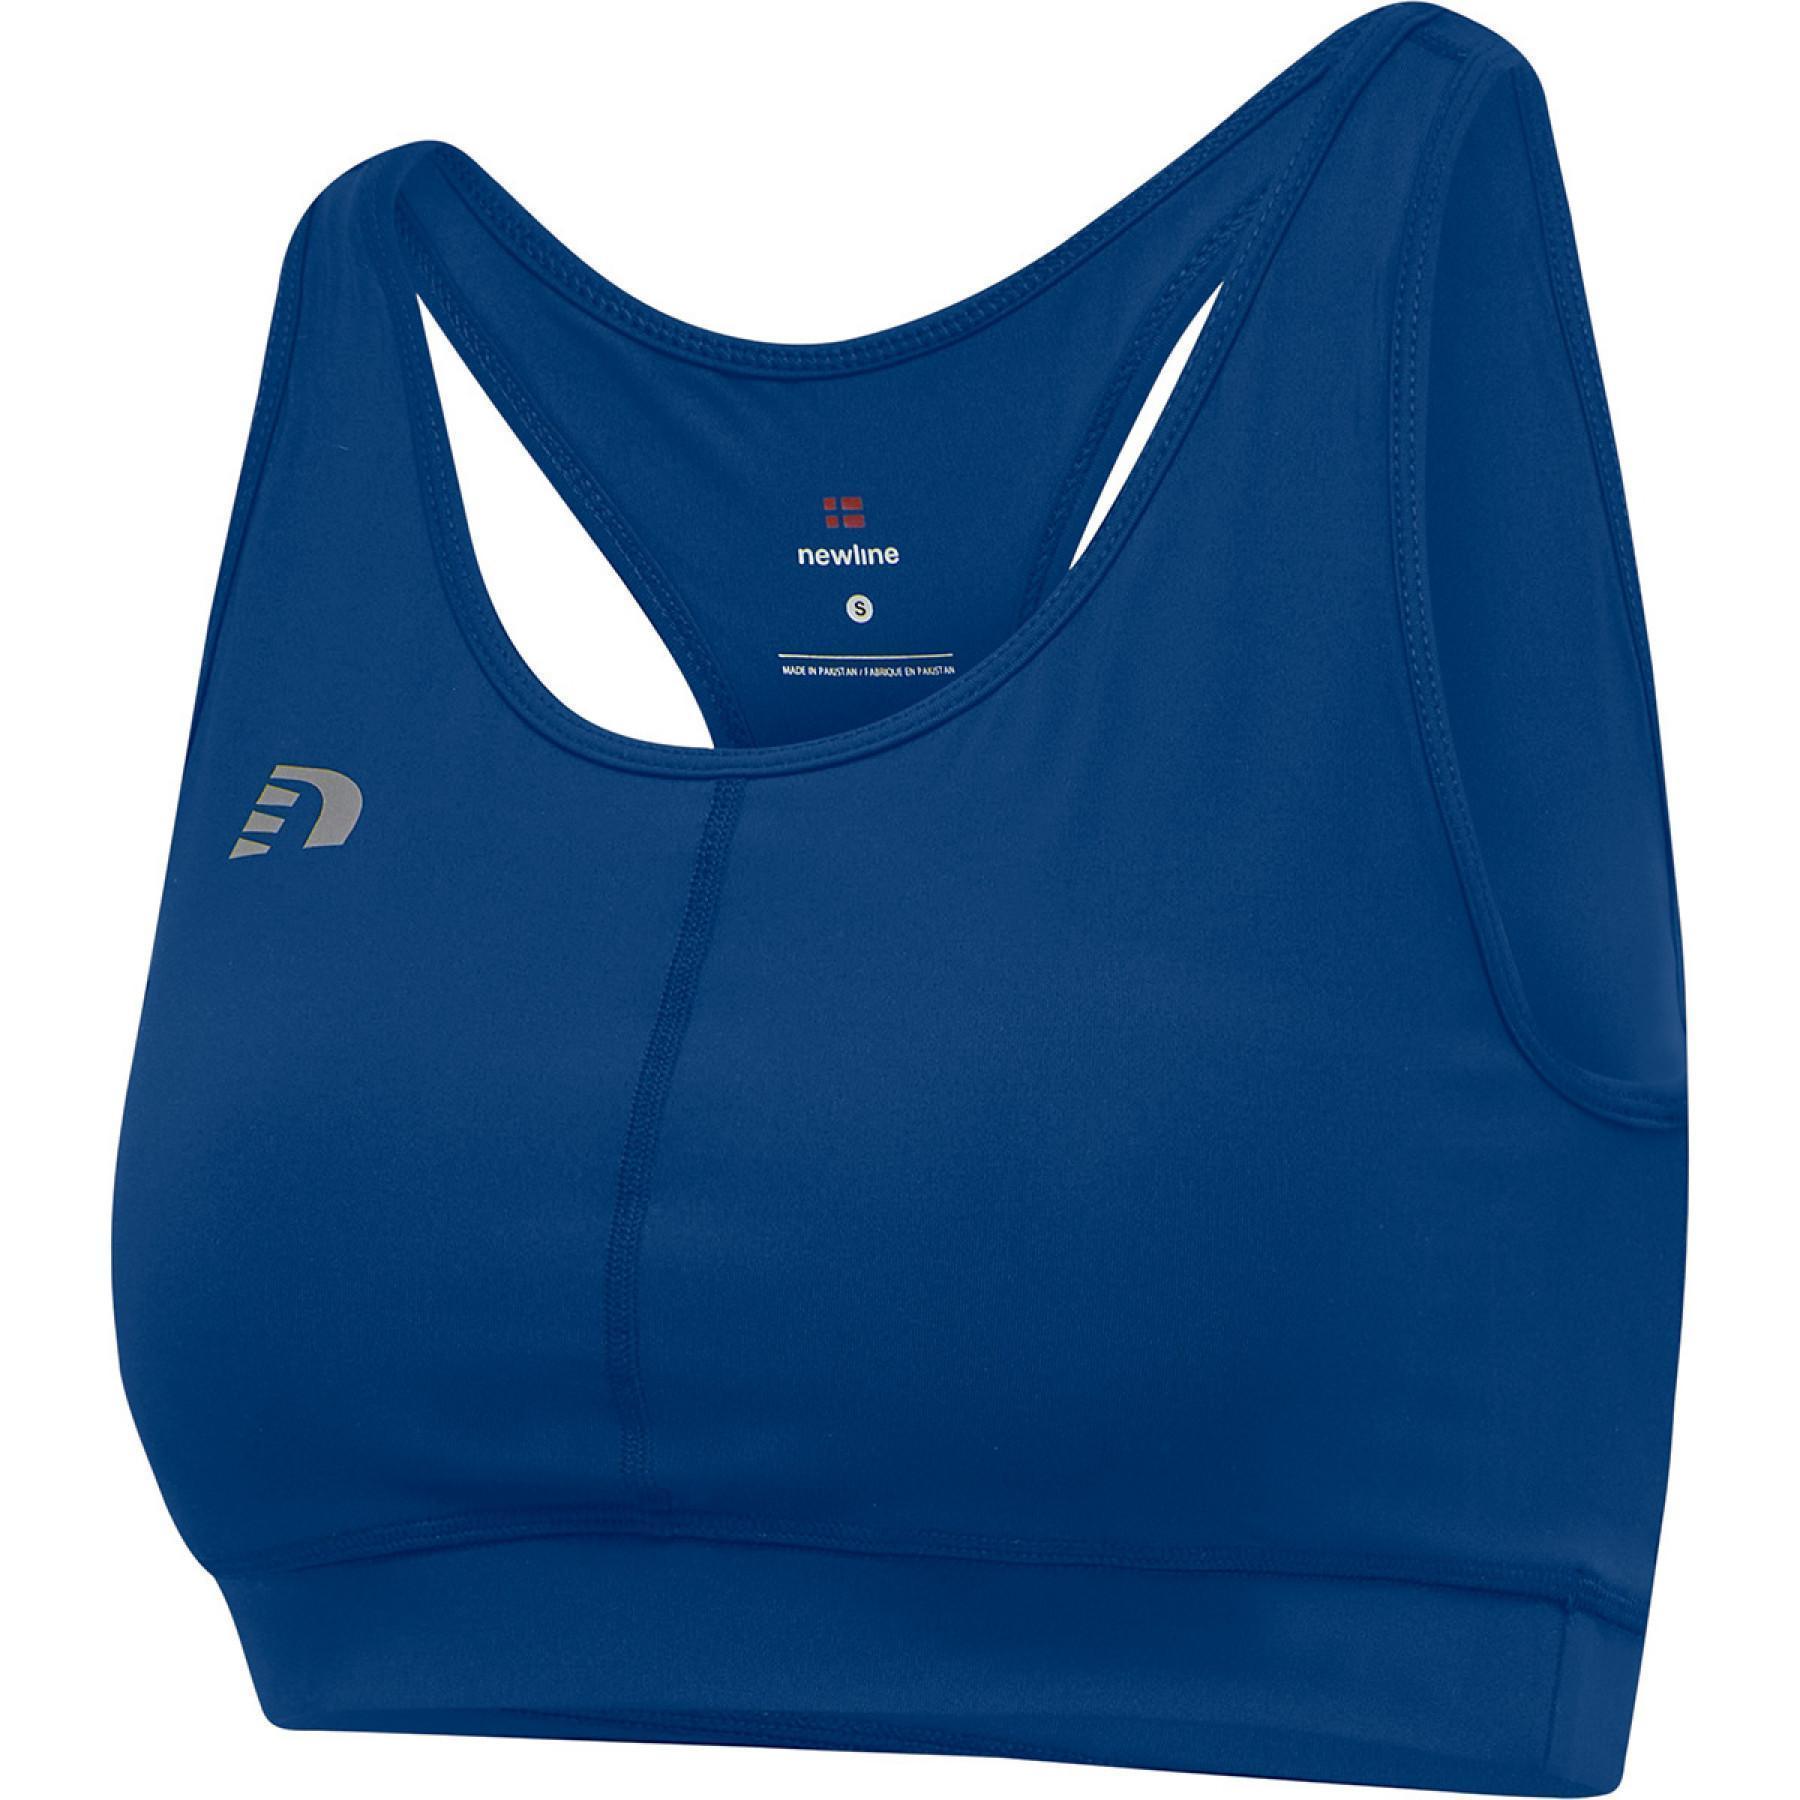 Women's bra Newline core athletic